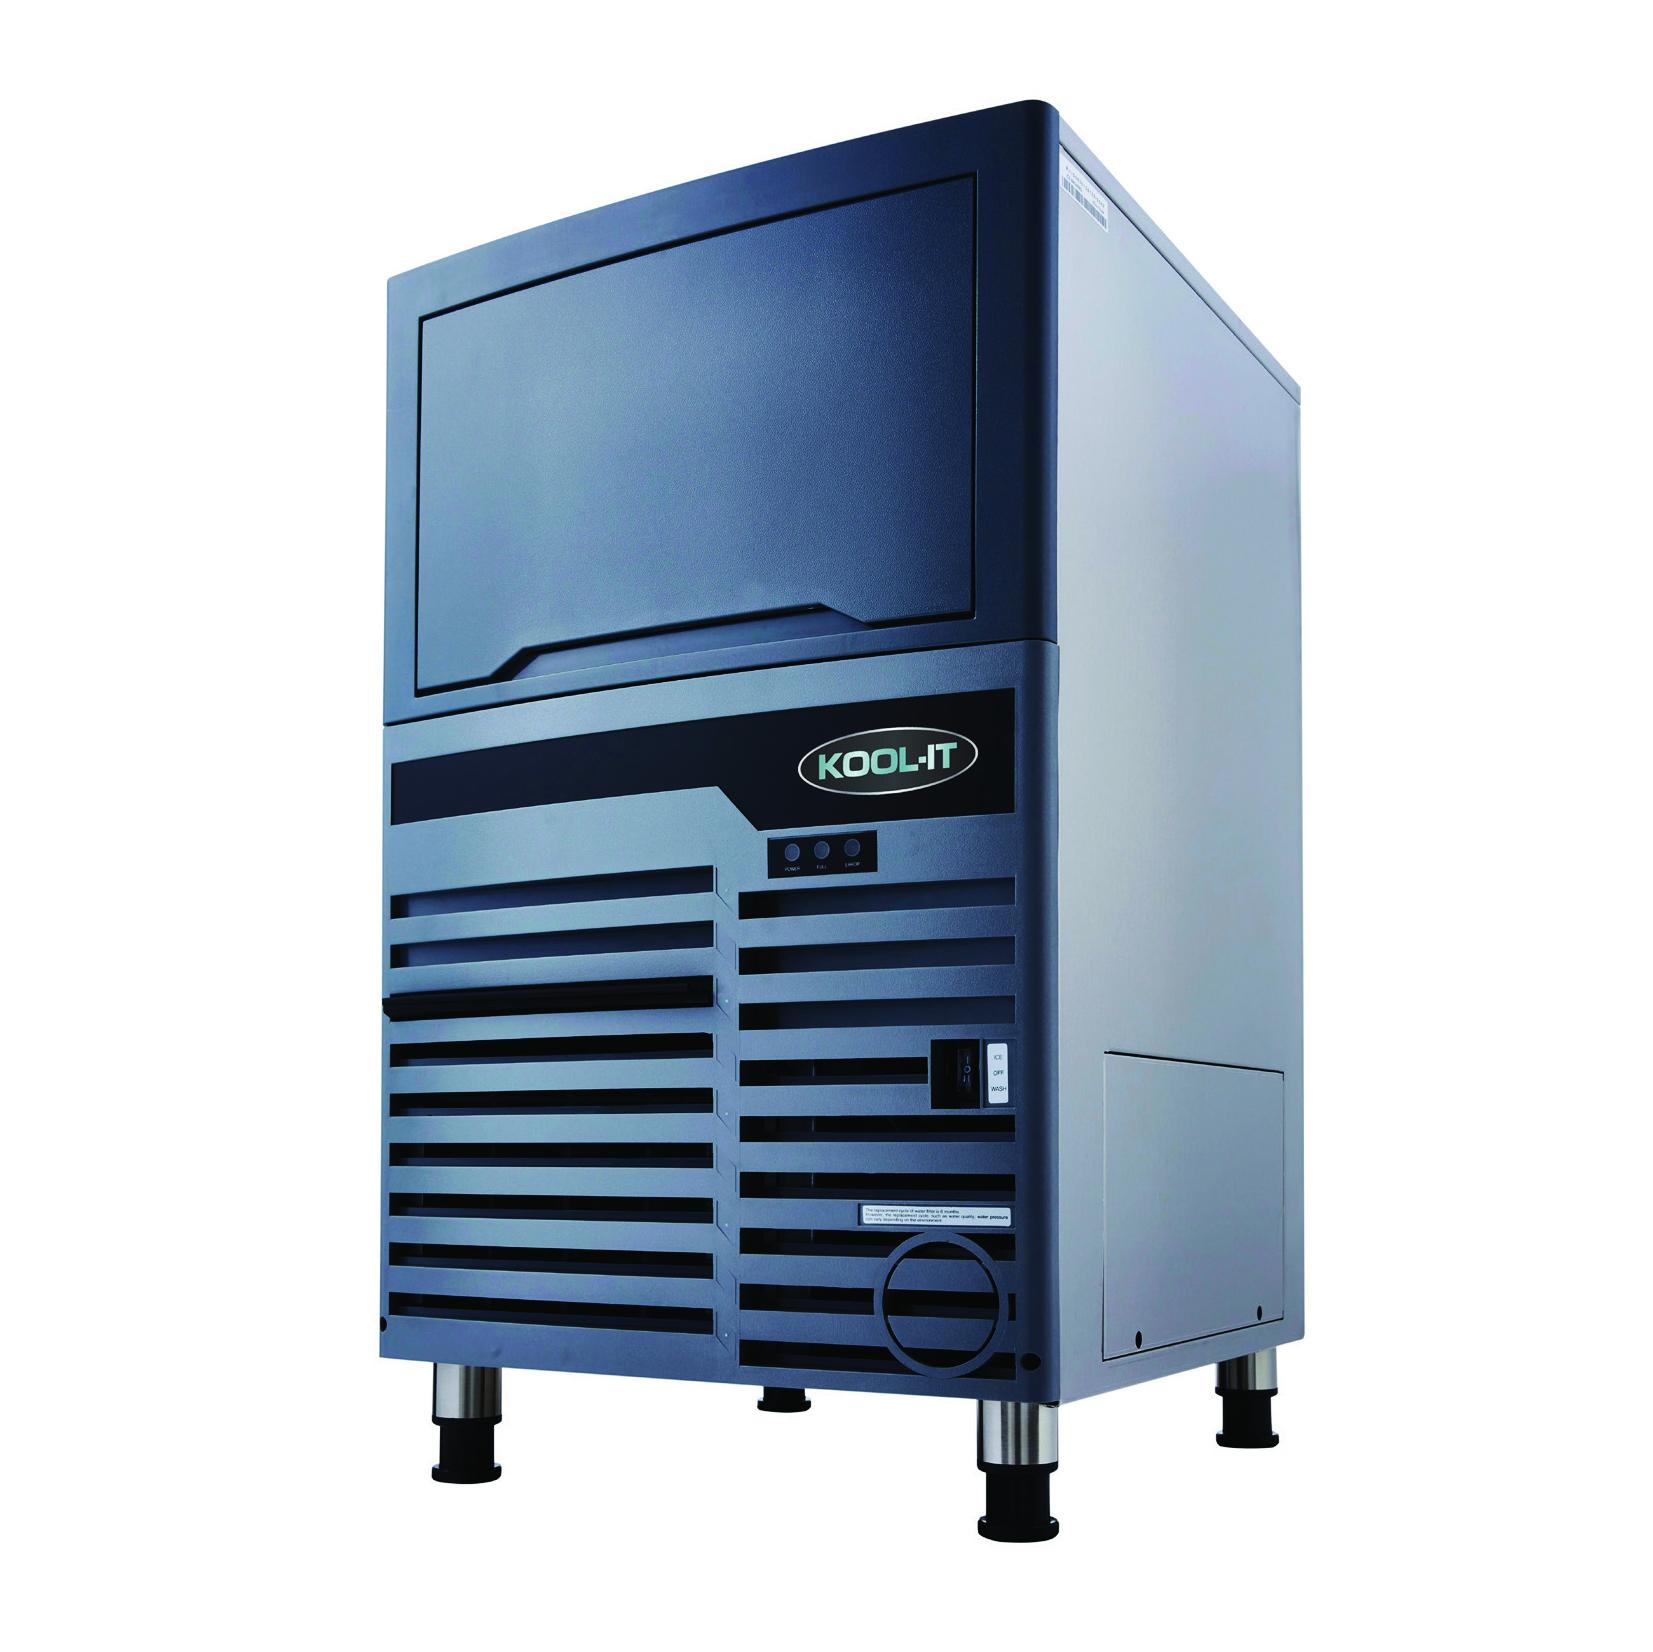 MVP Group LLC KCU-110-AH ice maker with bin, cube-style